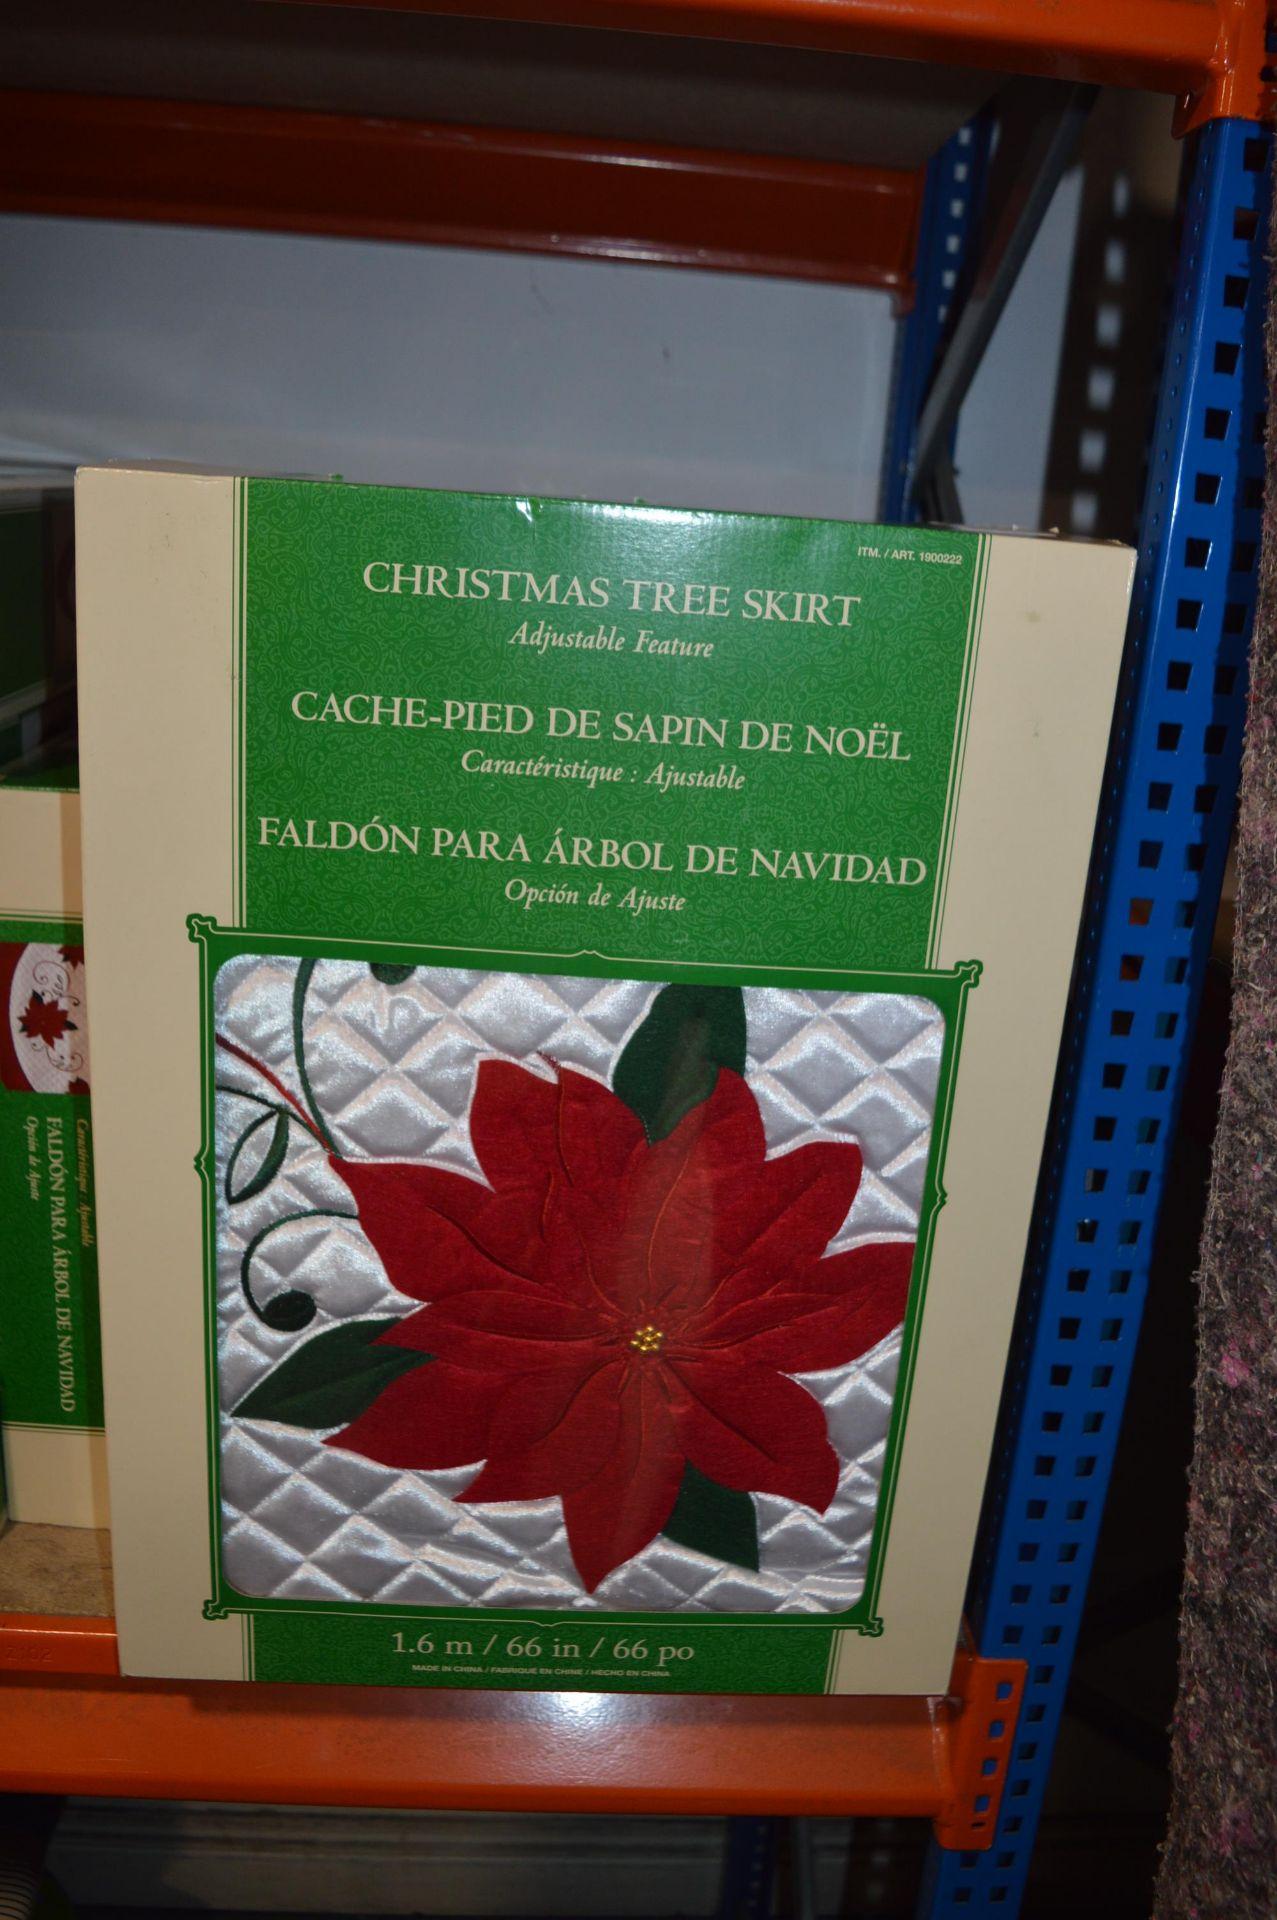 Lot 24 - *Christmas Tree Skirt 1.6m